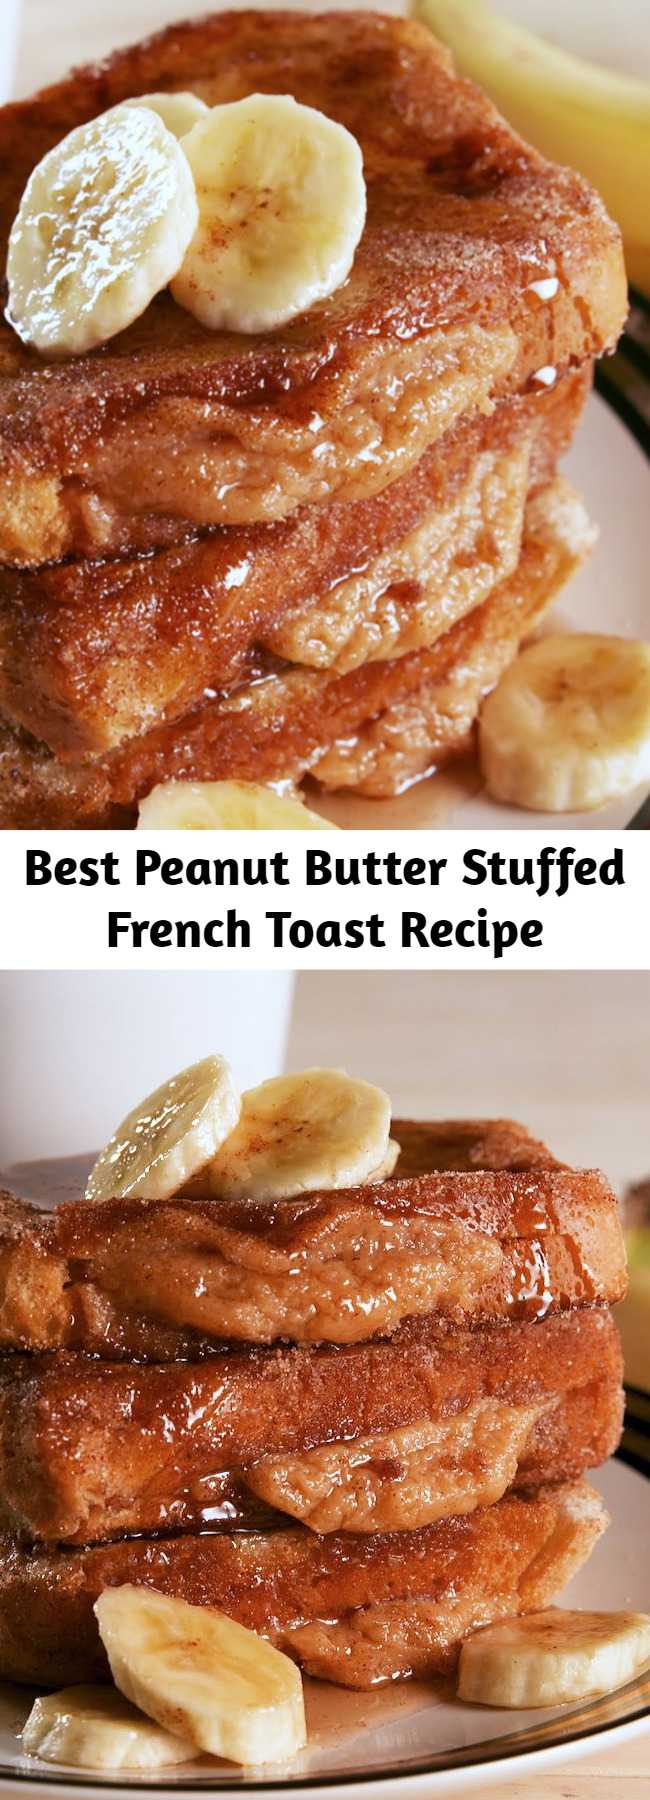 Best Peanut Butter Stuffed French Toast Recipe - Peanut Butter Stuffed French Toast Recipe - This Peanut Butter Stuffed French Toast gives new life to breakfast. Get out of town. #easyrecipe #breakfast #brunch #peanutbutter #food